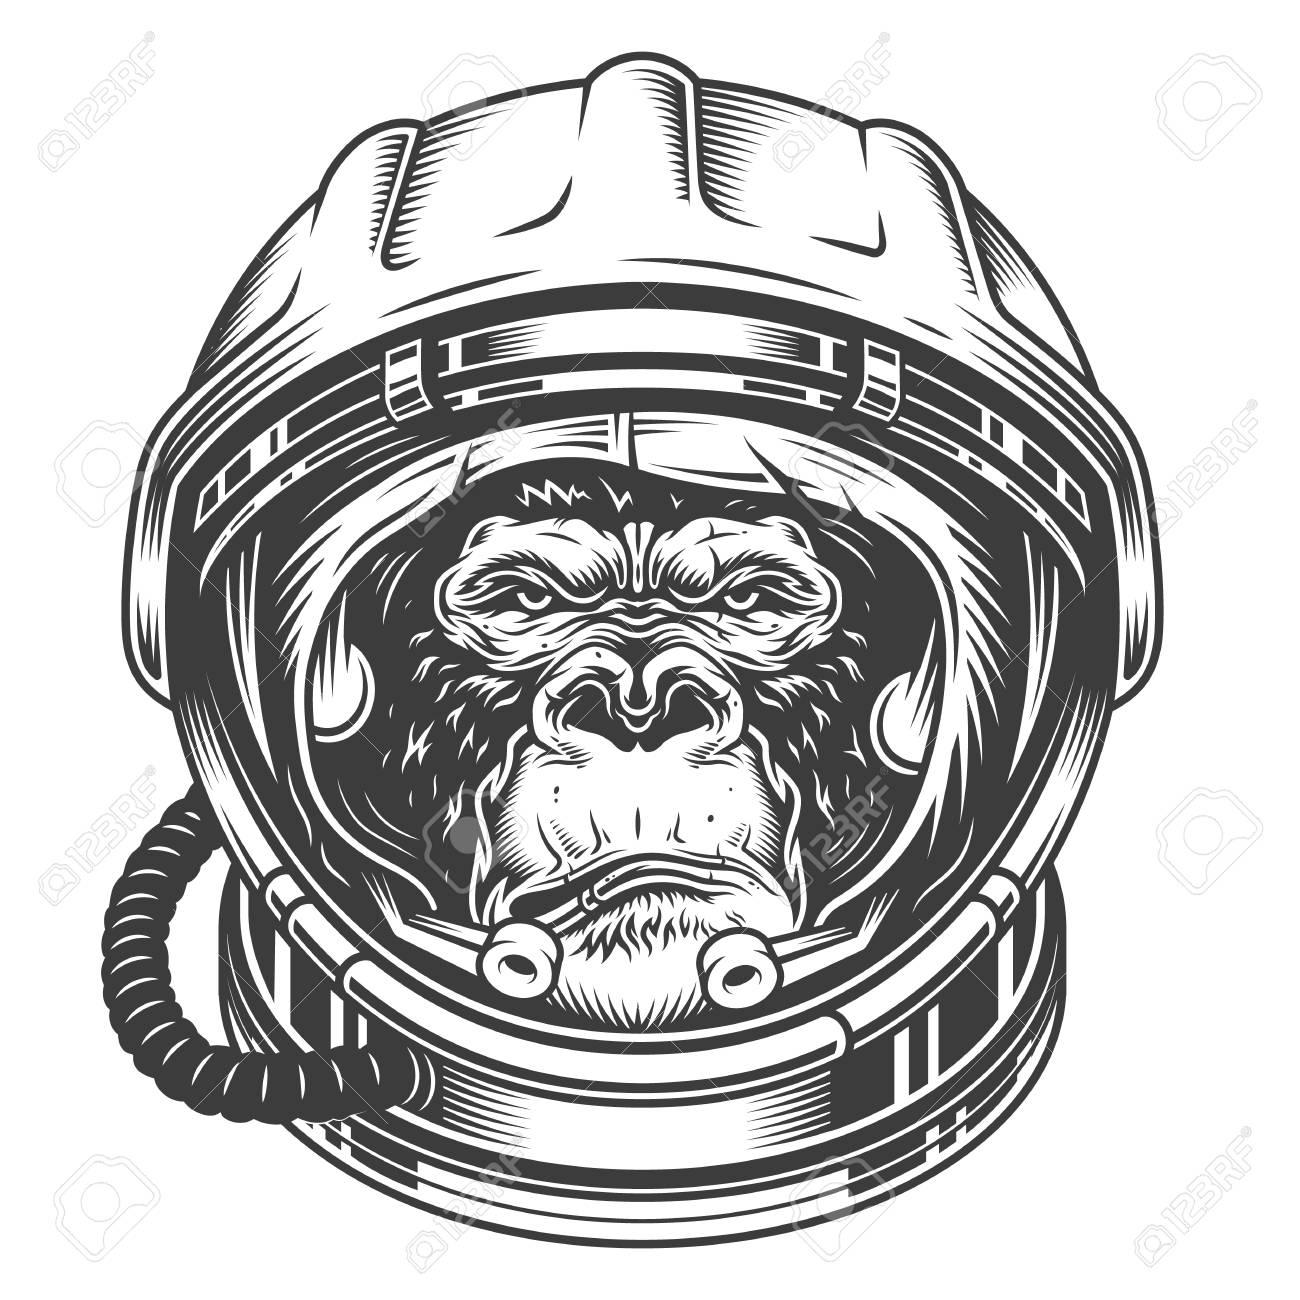 Head of gorilla - 104040532